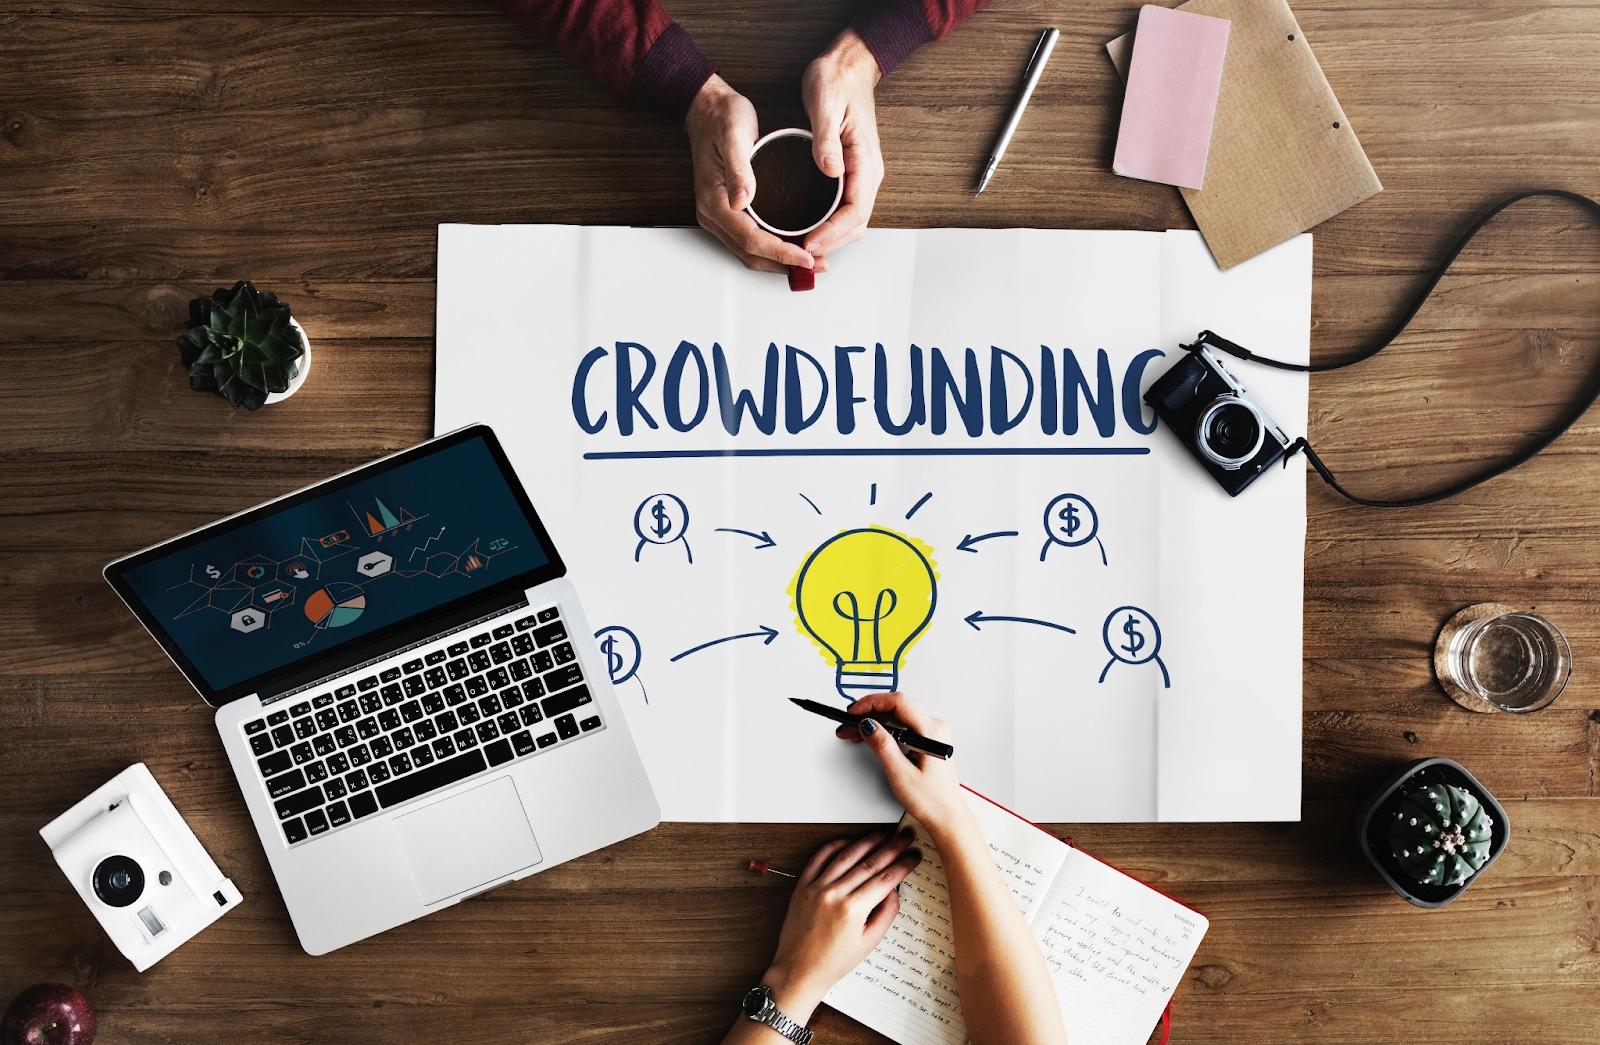 4 Easy Steps For A Successful Crowdfunding | Youth Ki Awaaz